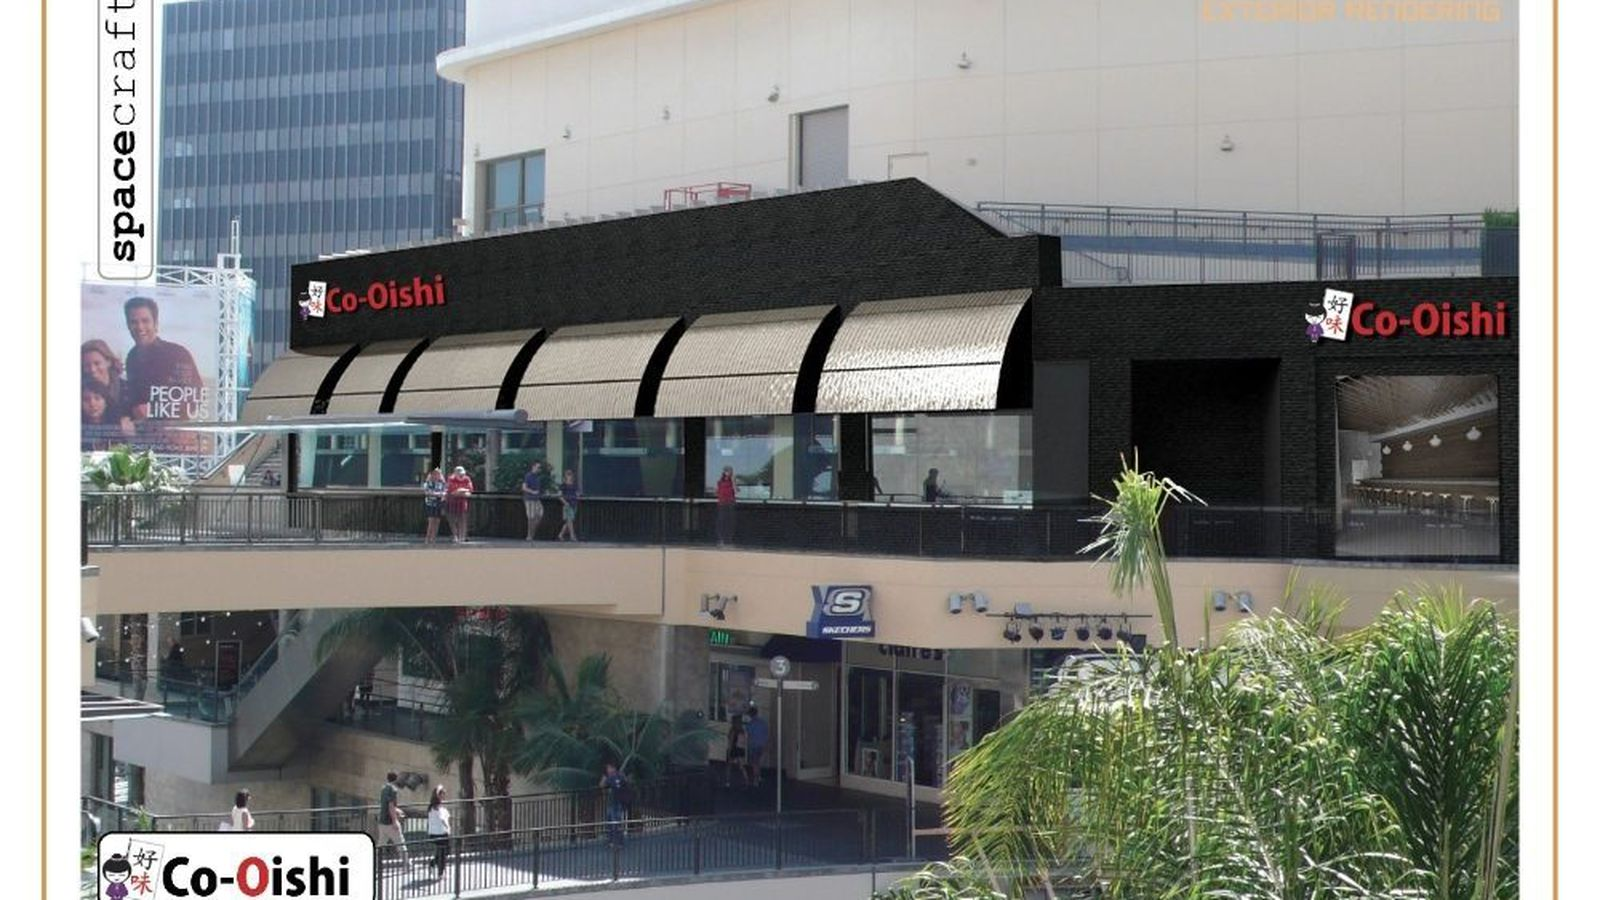 Japanese Restaurant Hollywood And Highland